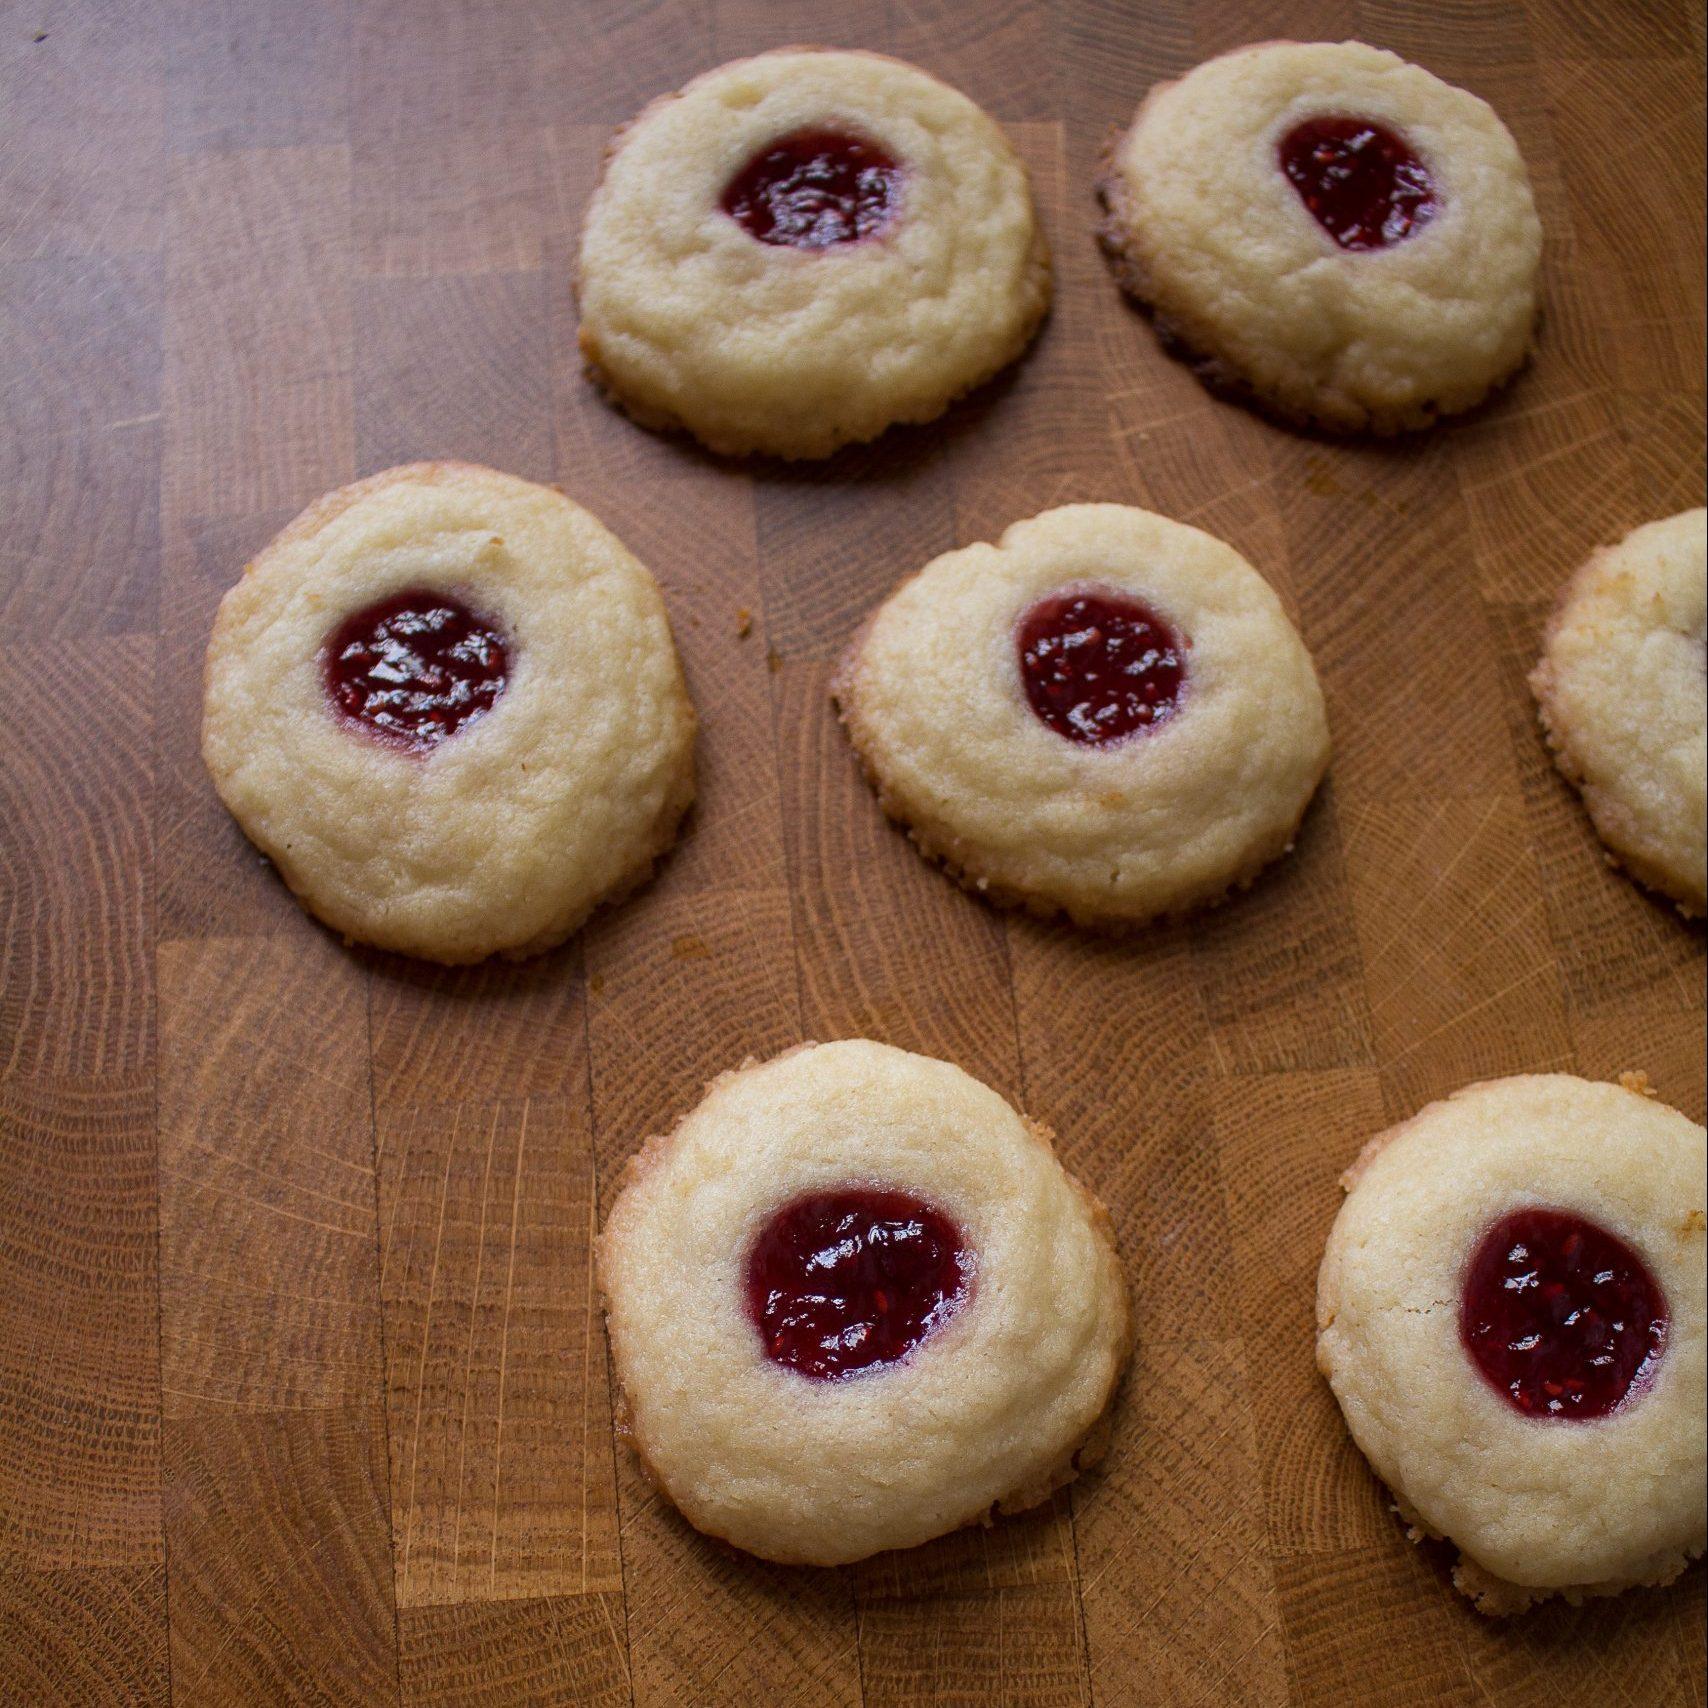 Summertime cookies right here! Raspberry Almond cookies| Teaspoon of Nose